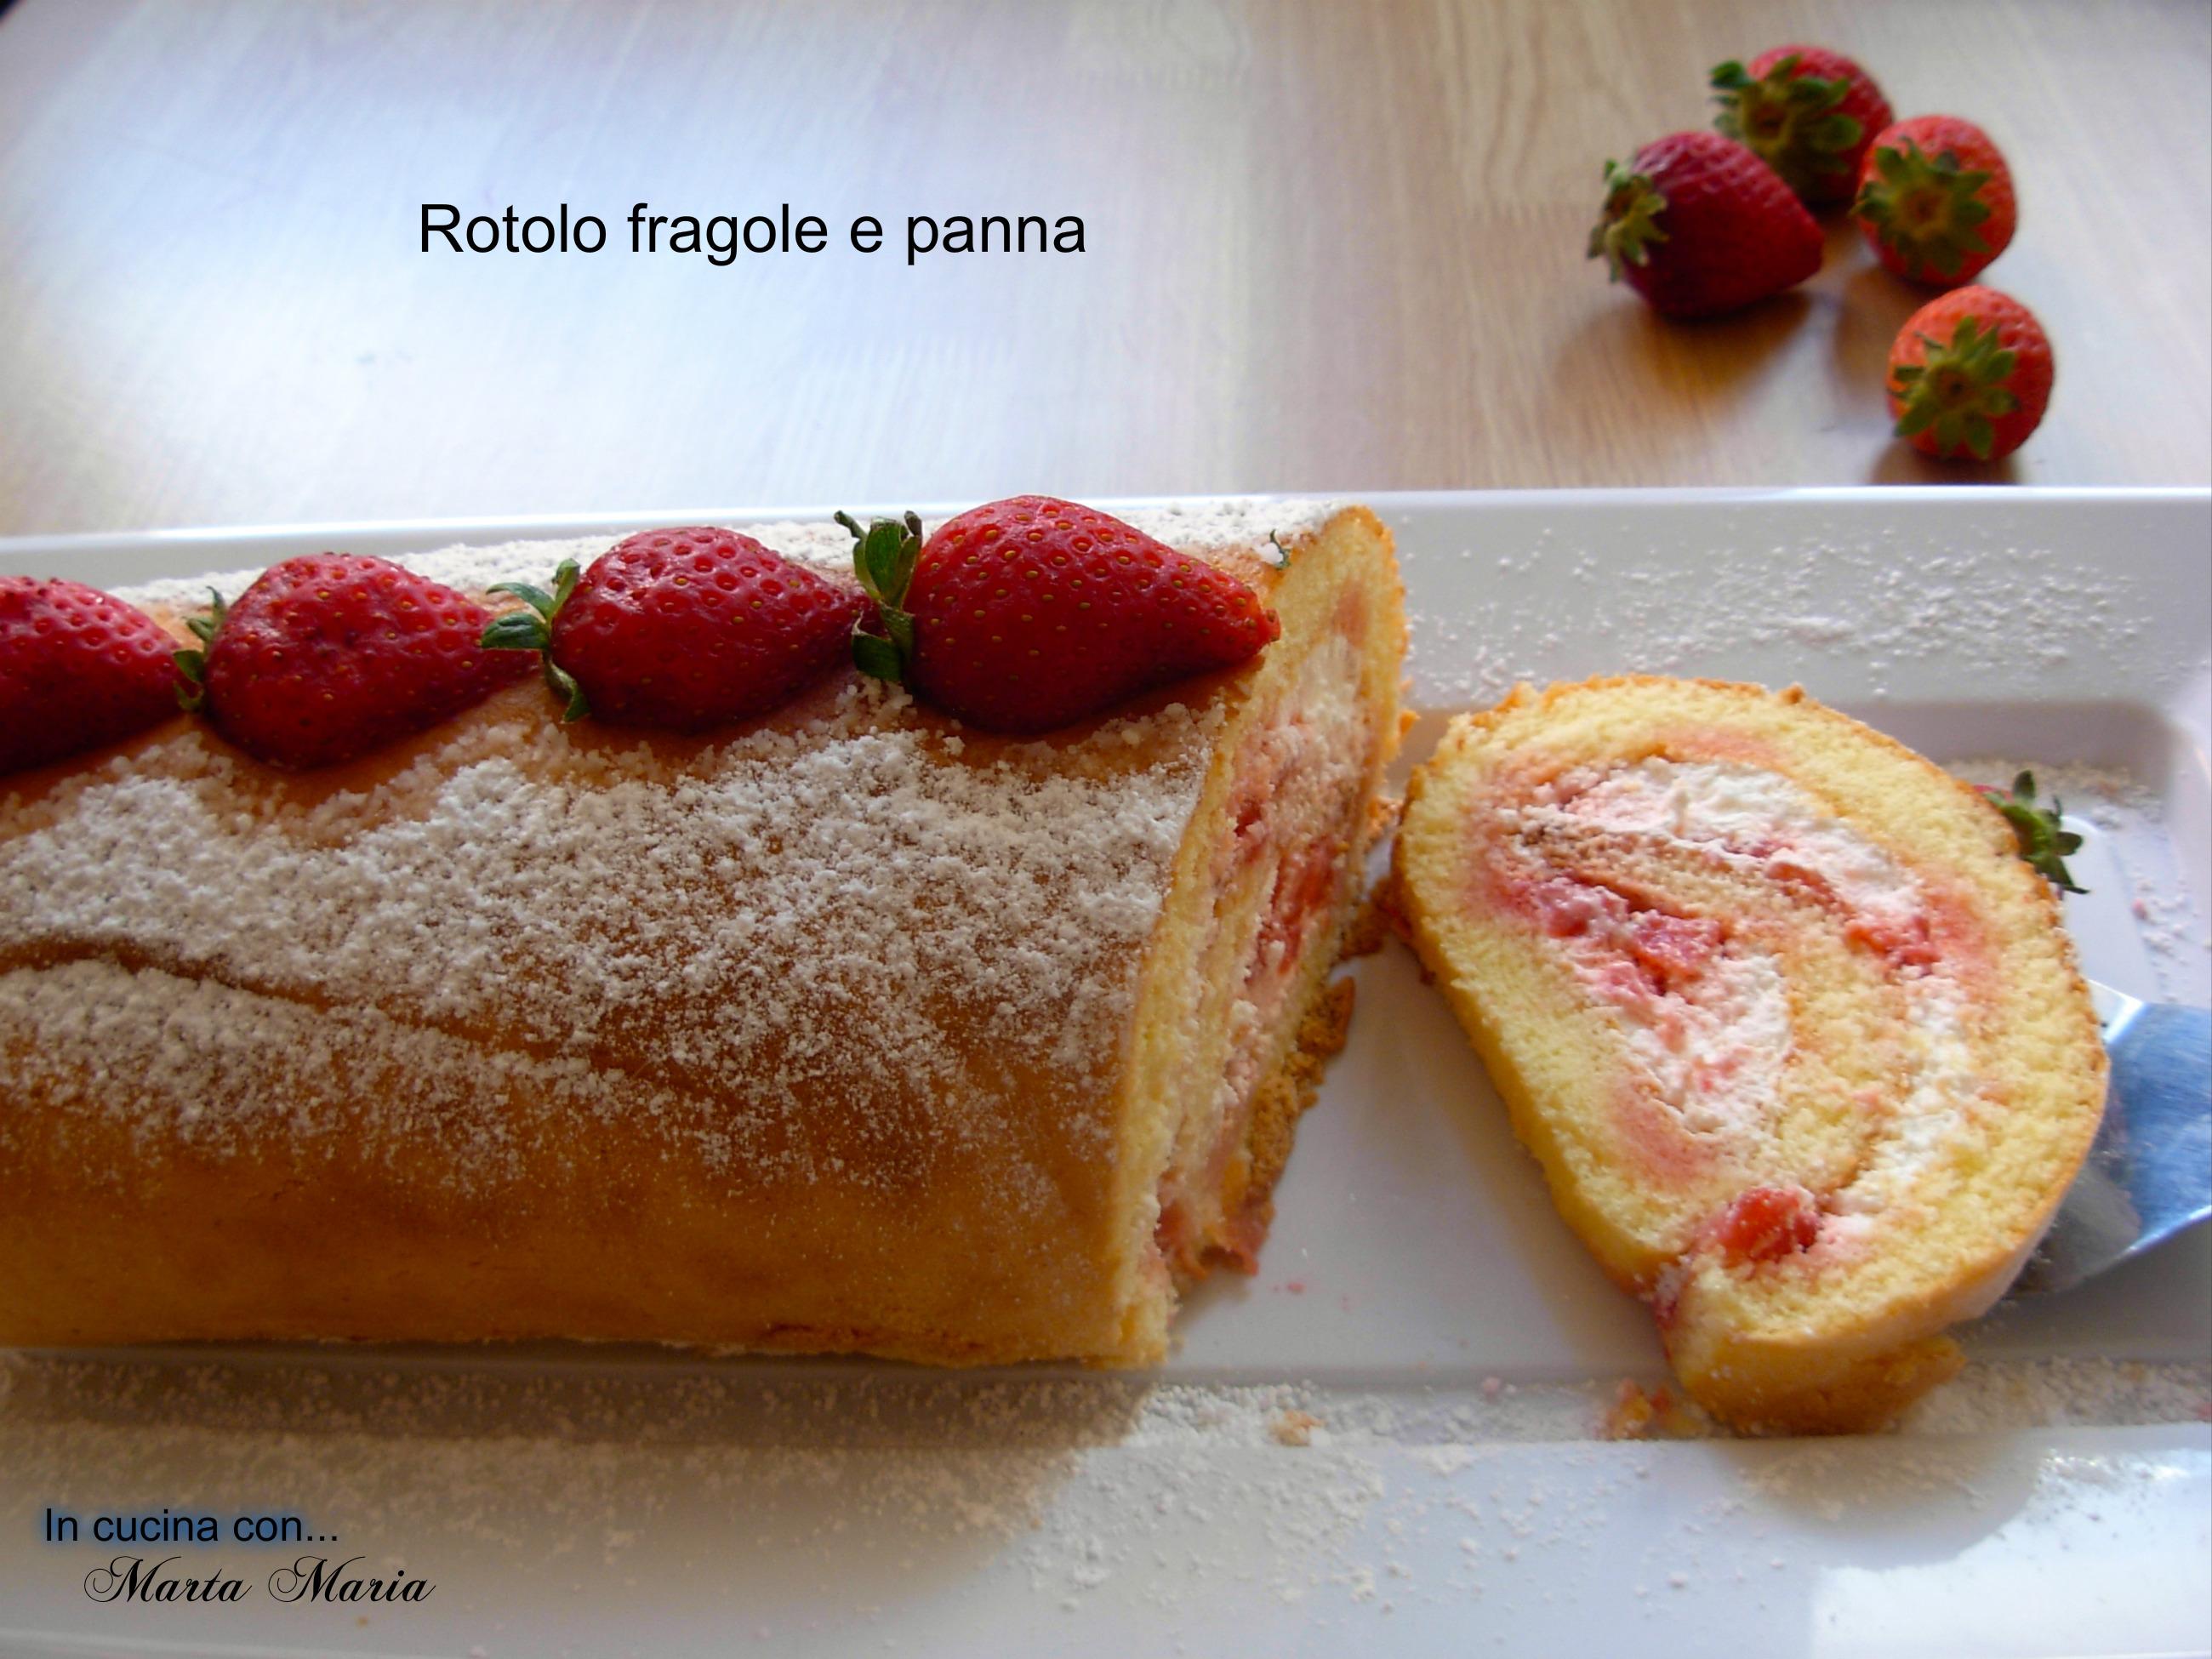 ROTOLO FRAGOLE E PANNA, ricetta facile